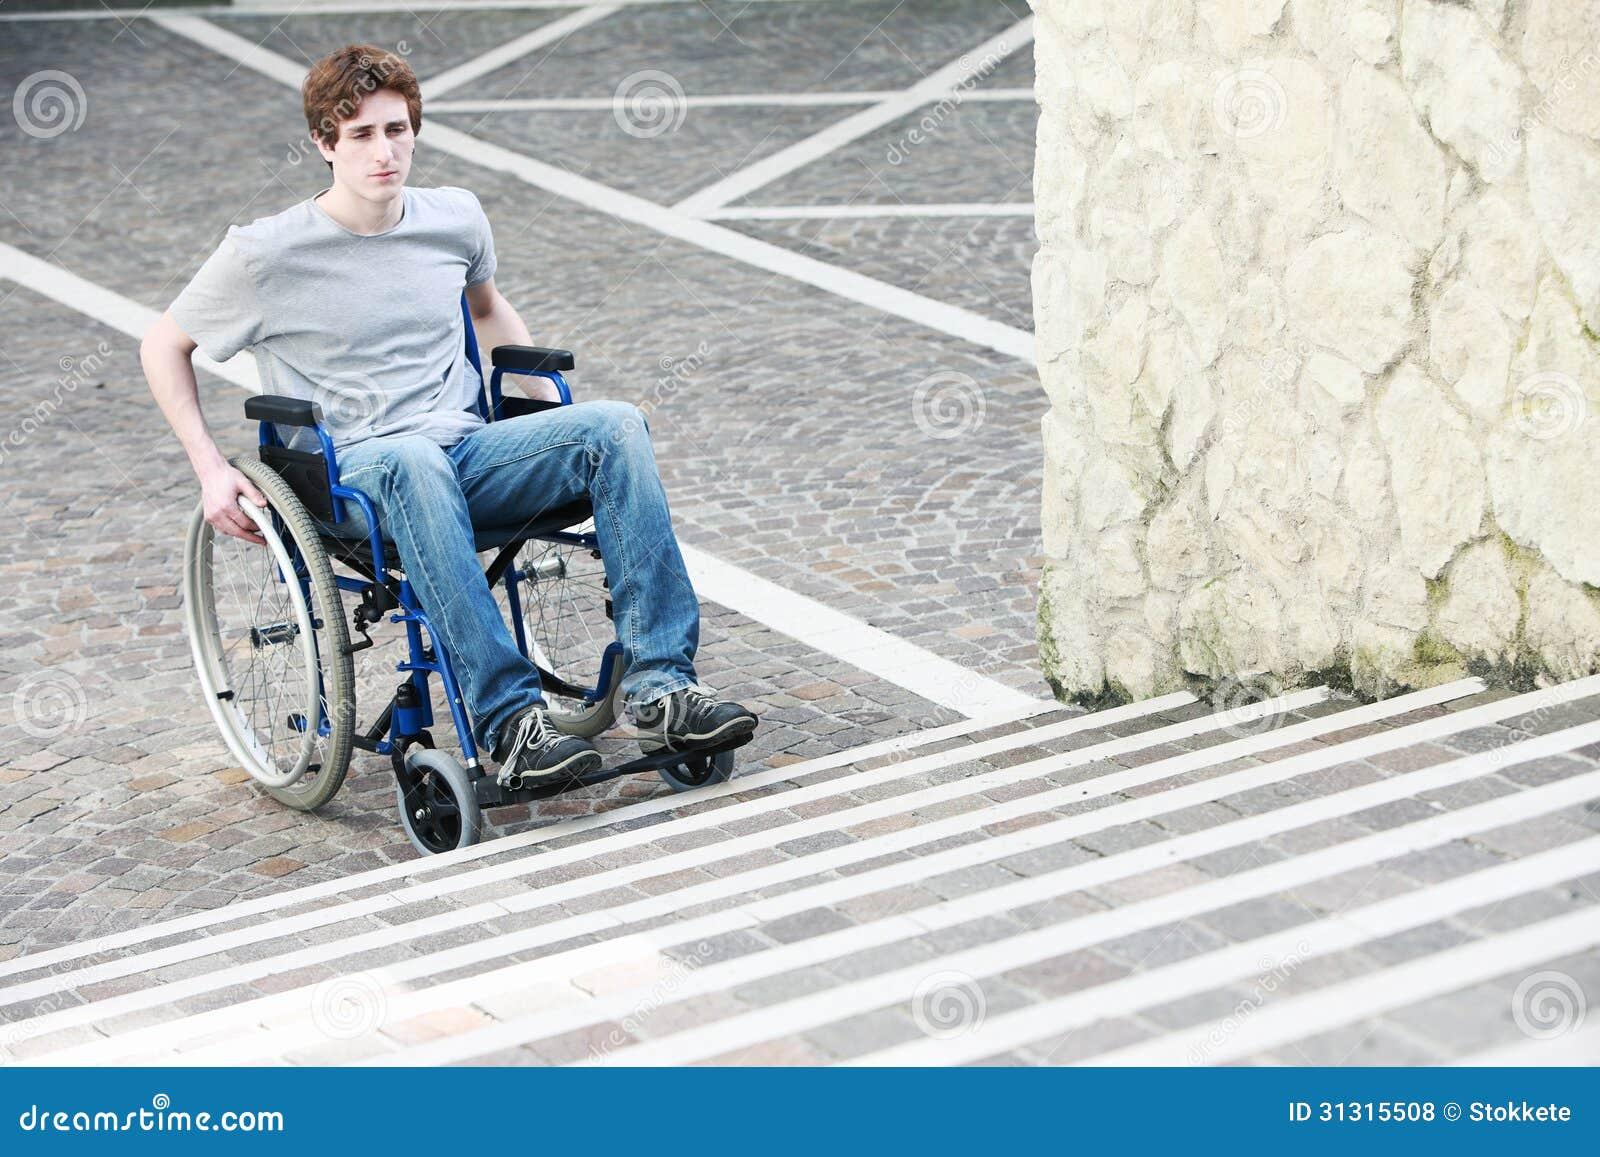 handicap dating free Frederiksberg